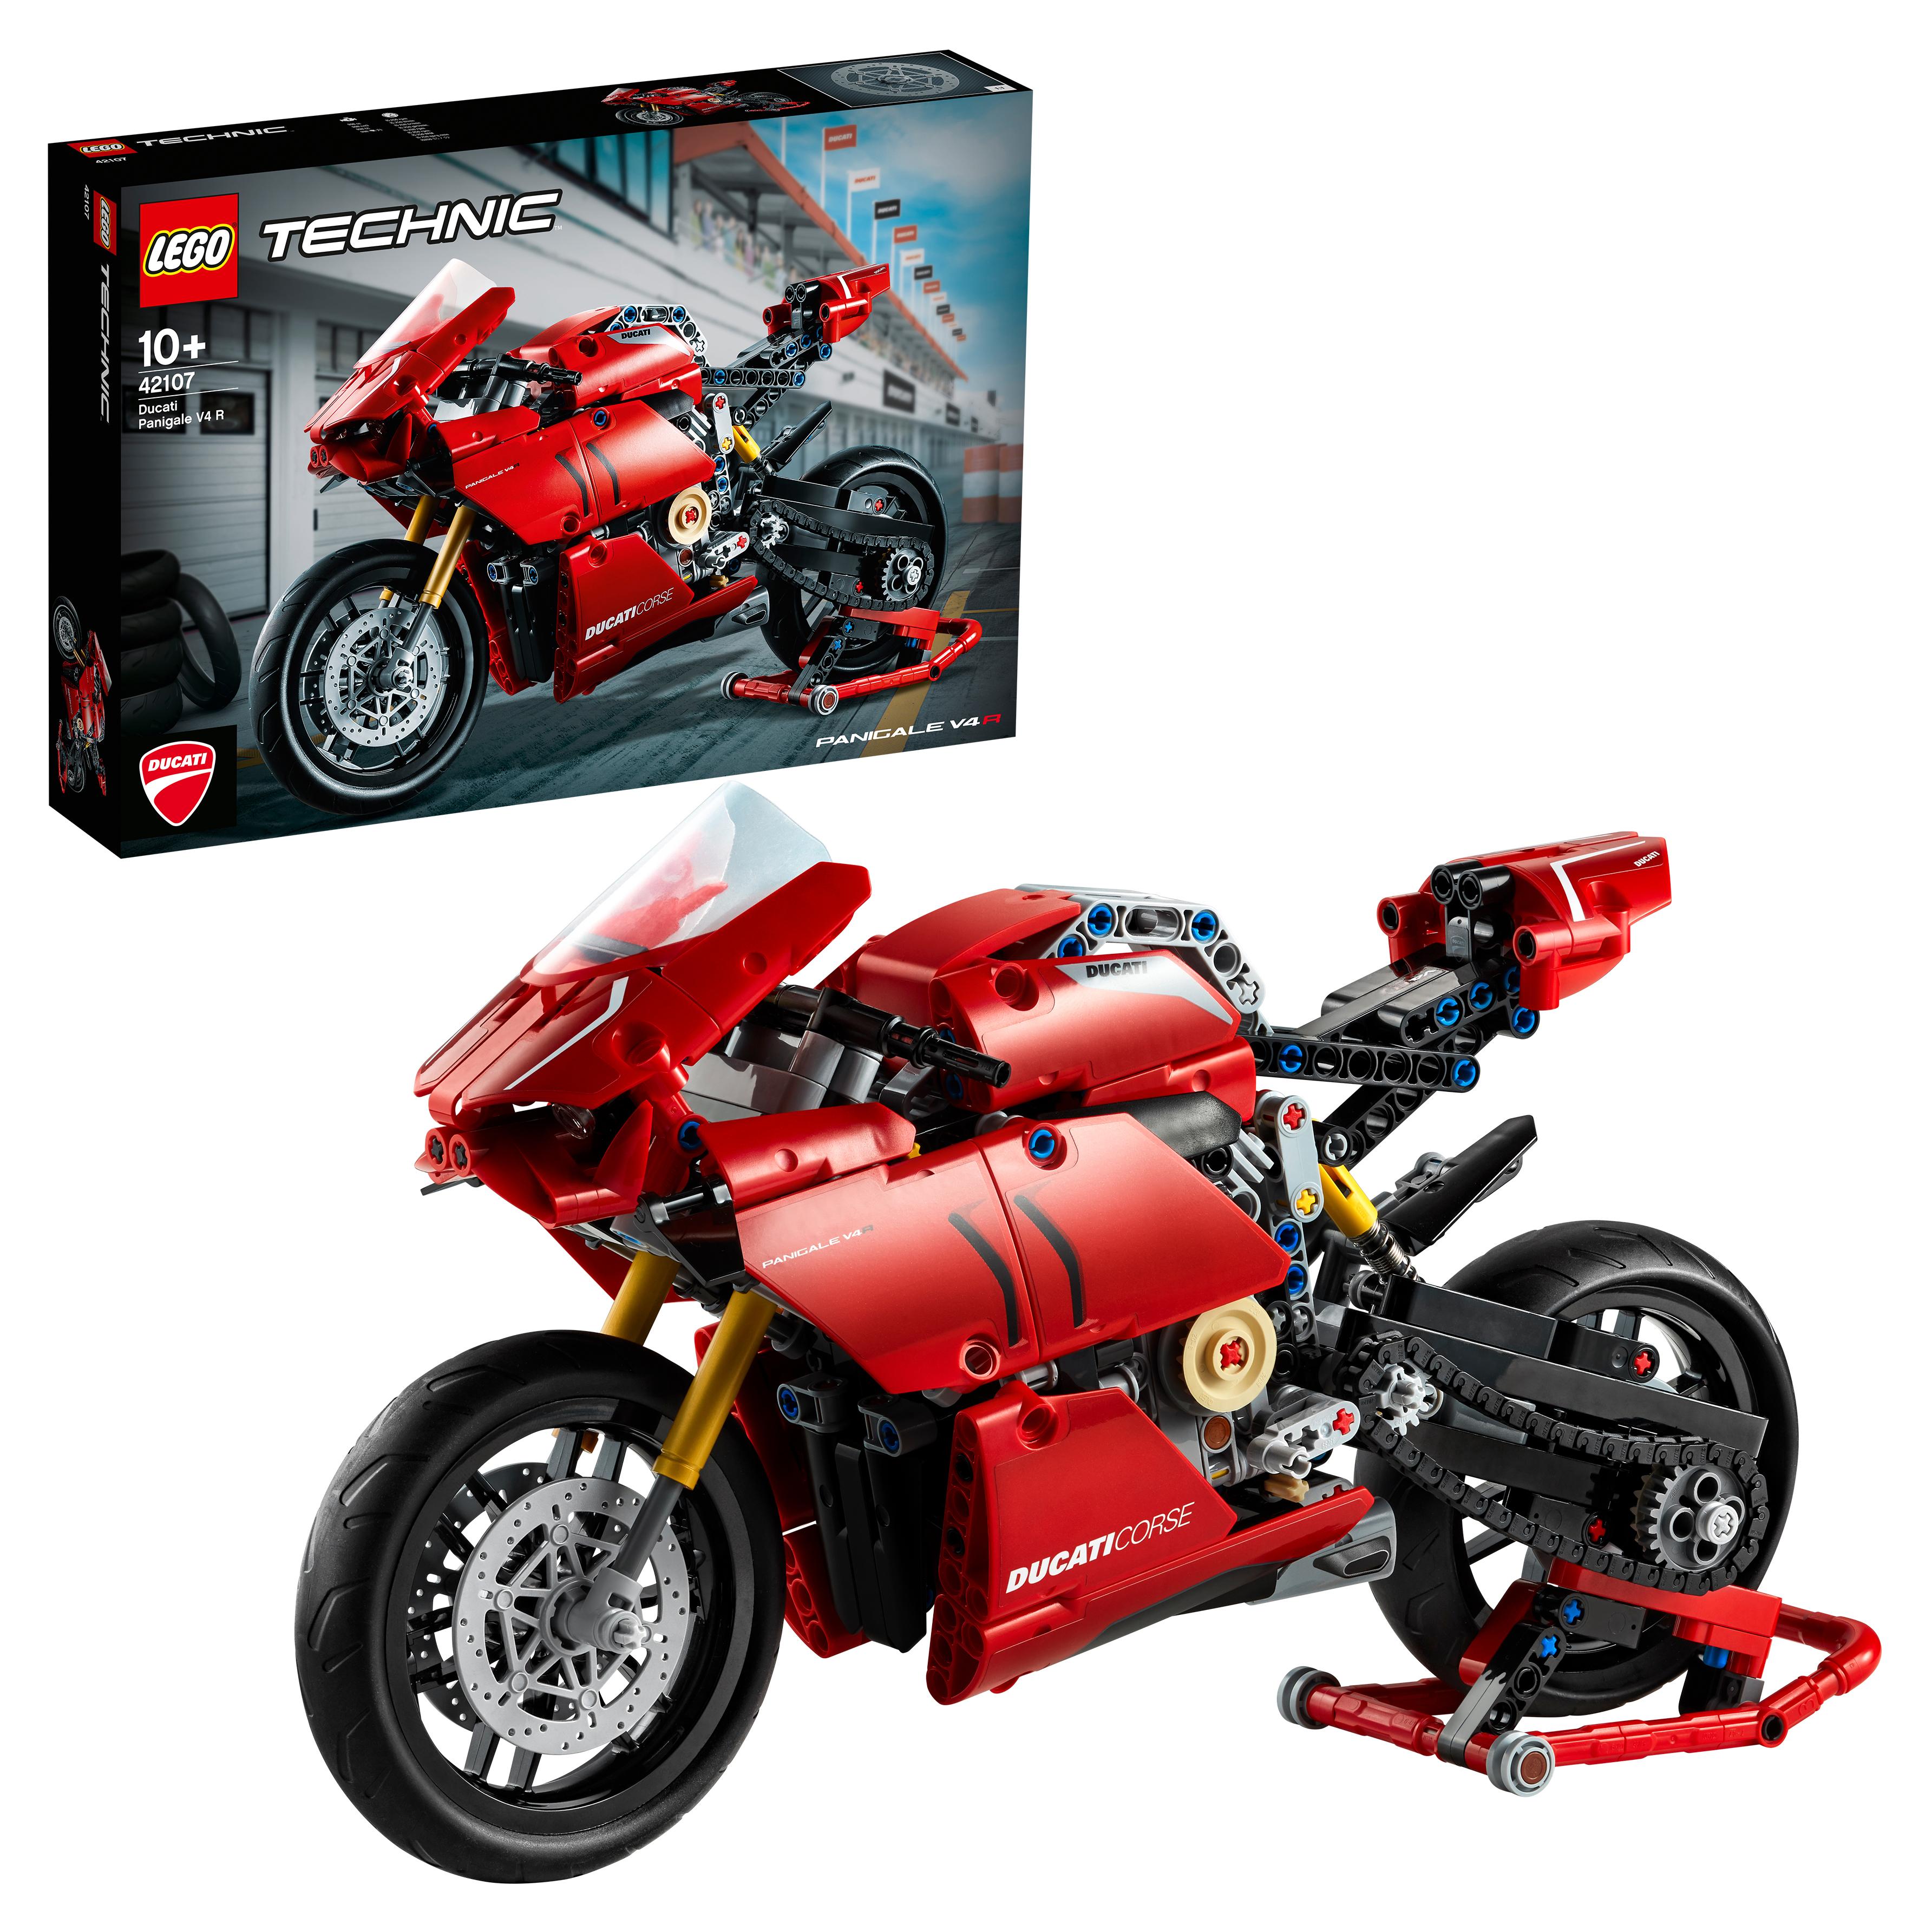 Конструктор LEGO Technic 42107 Ducati Panigale